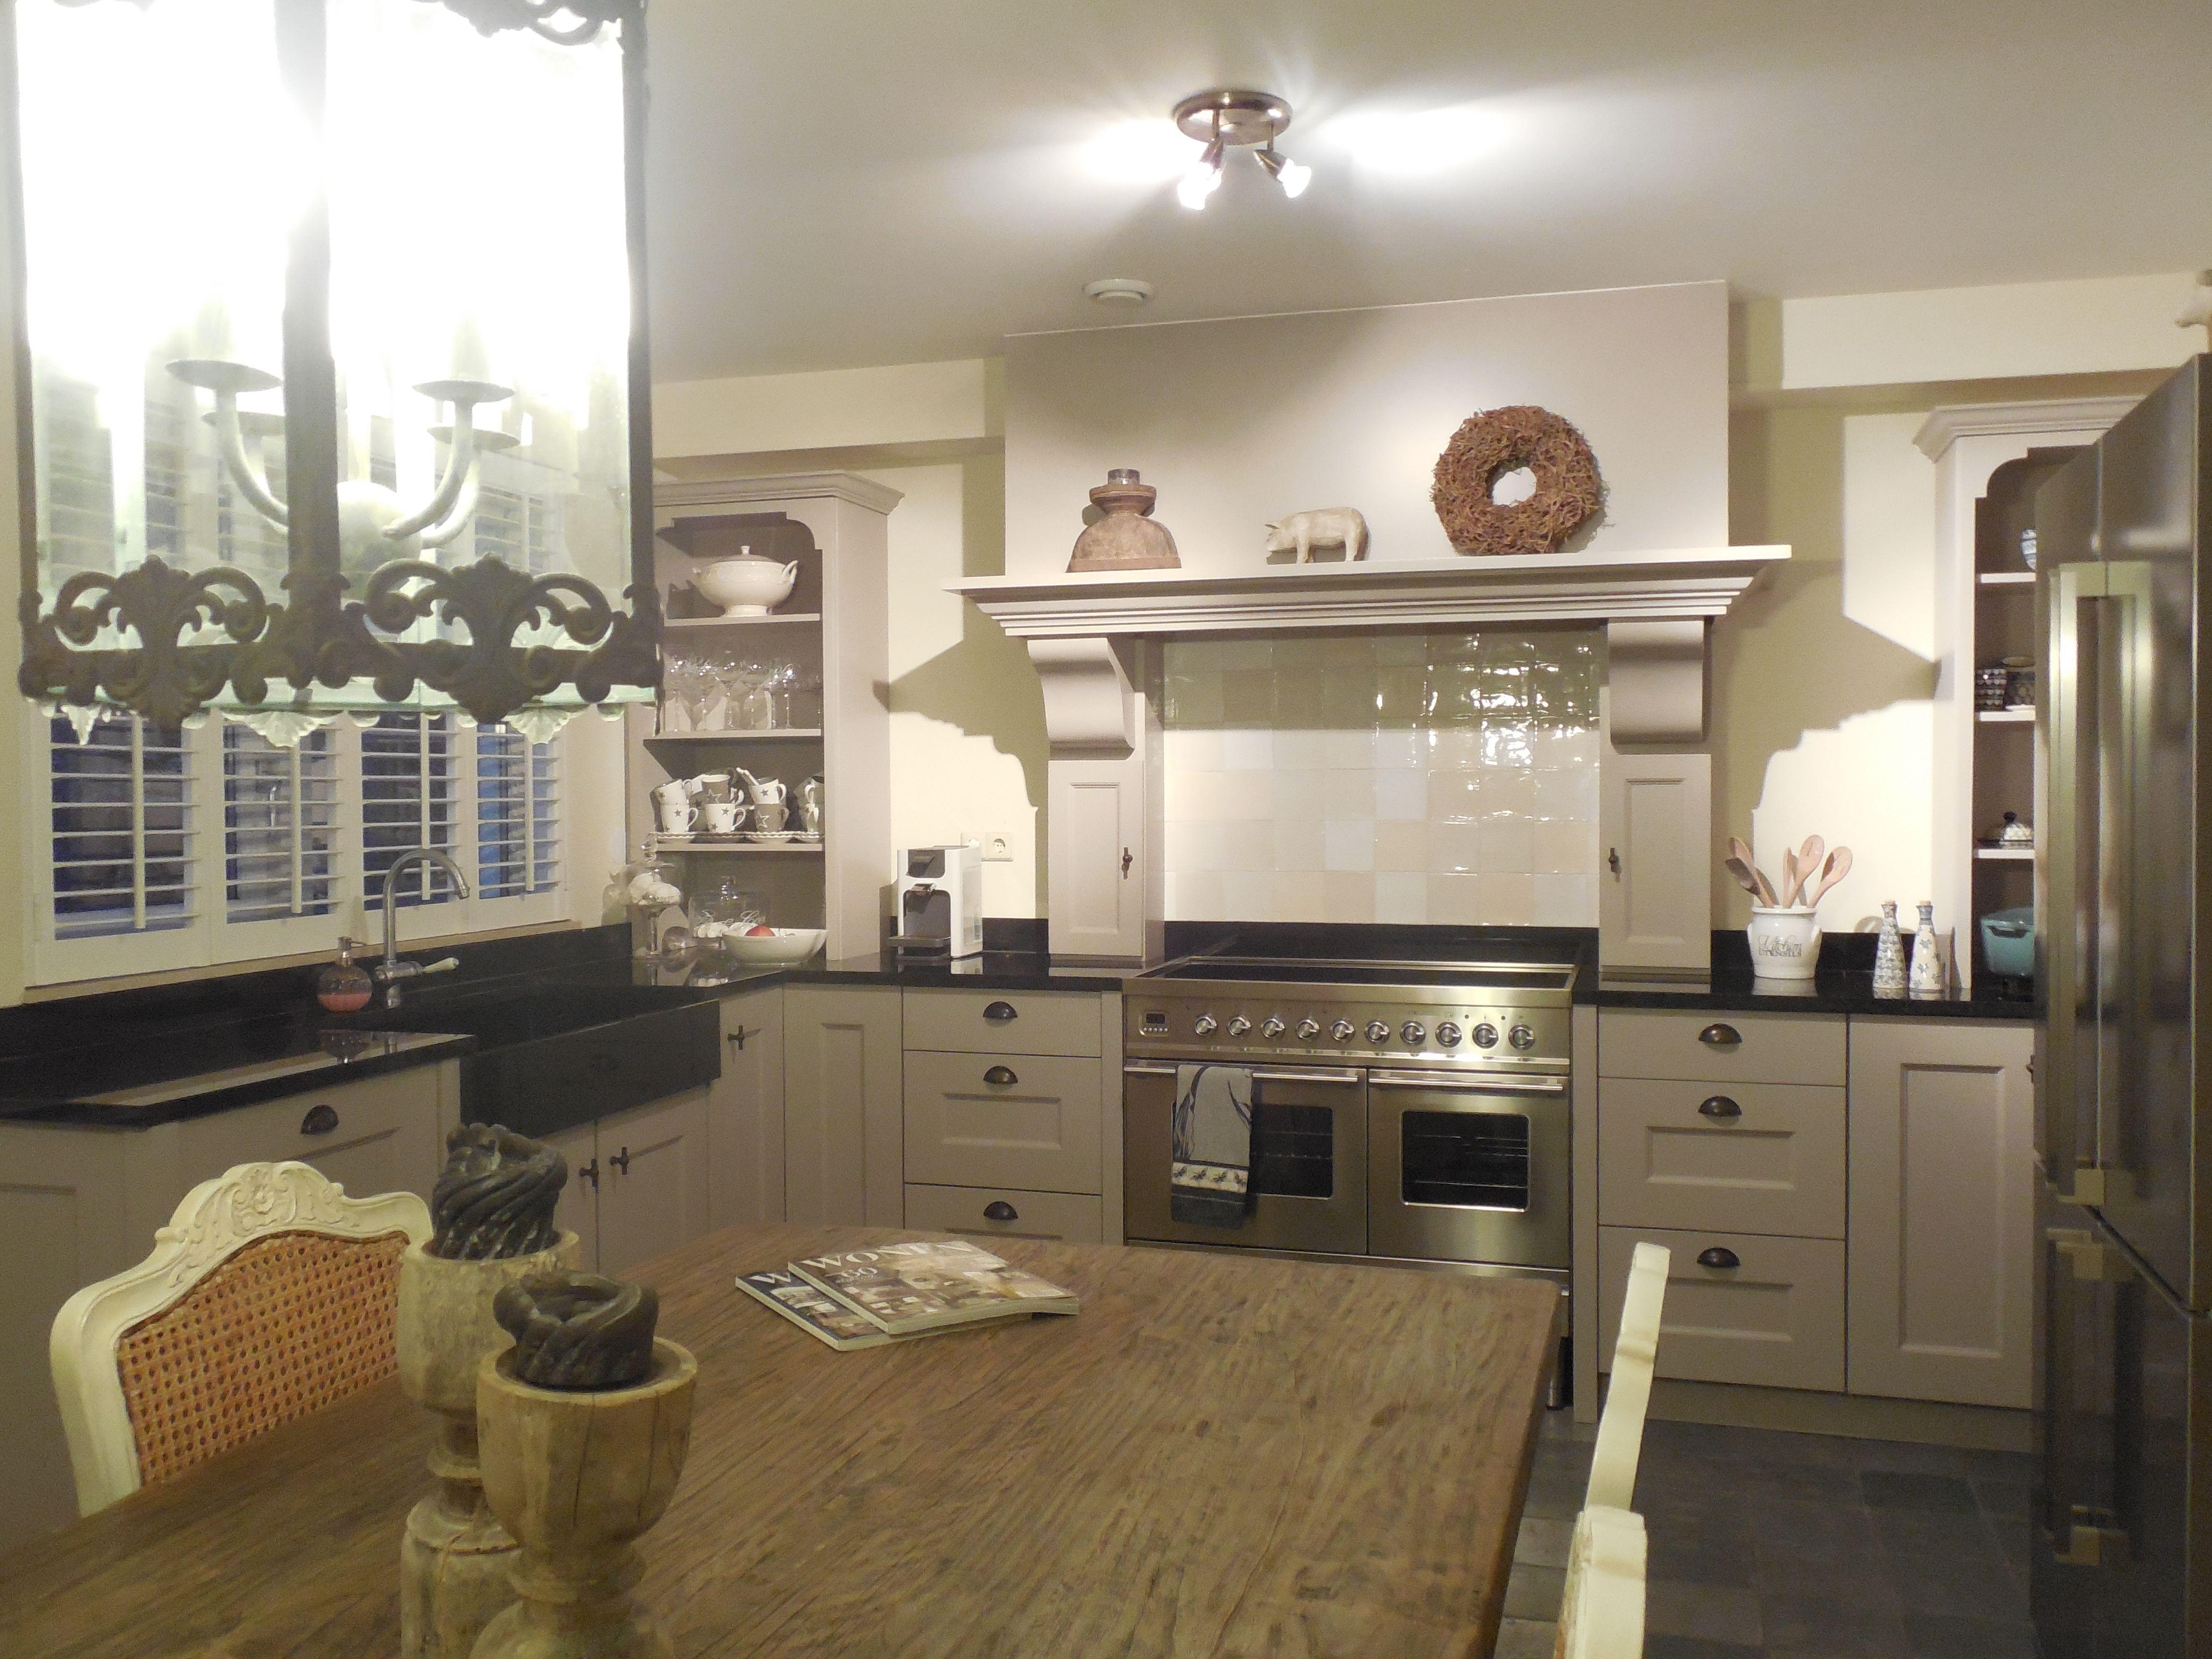 Farmhouse Keuken Landelijk : Stijlvolle landelijke keuken met borretti fornuis met dubbele oven